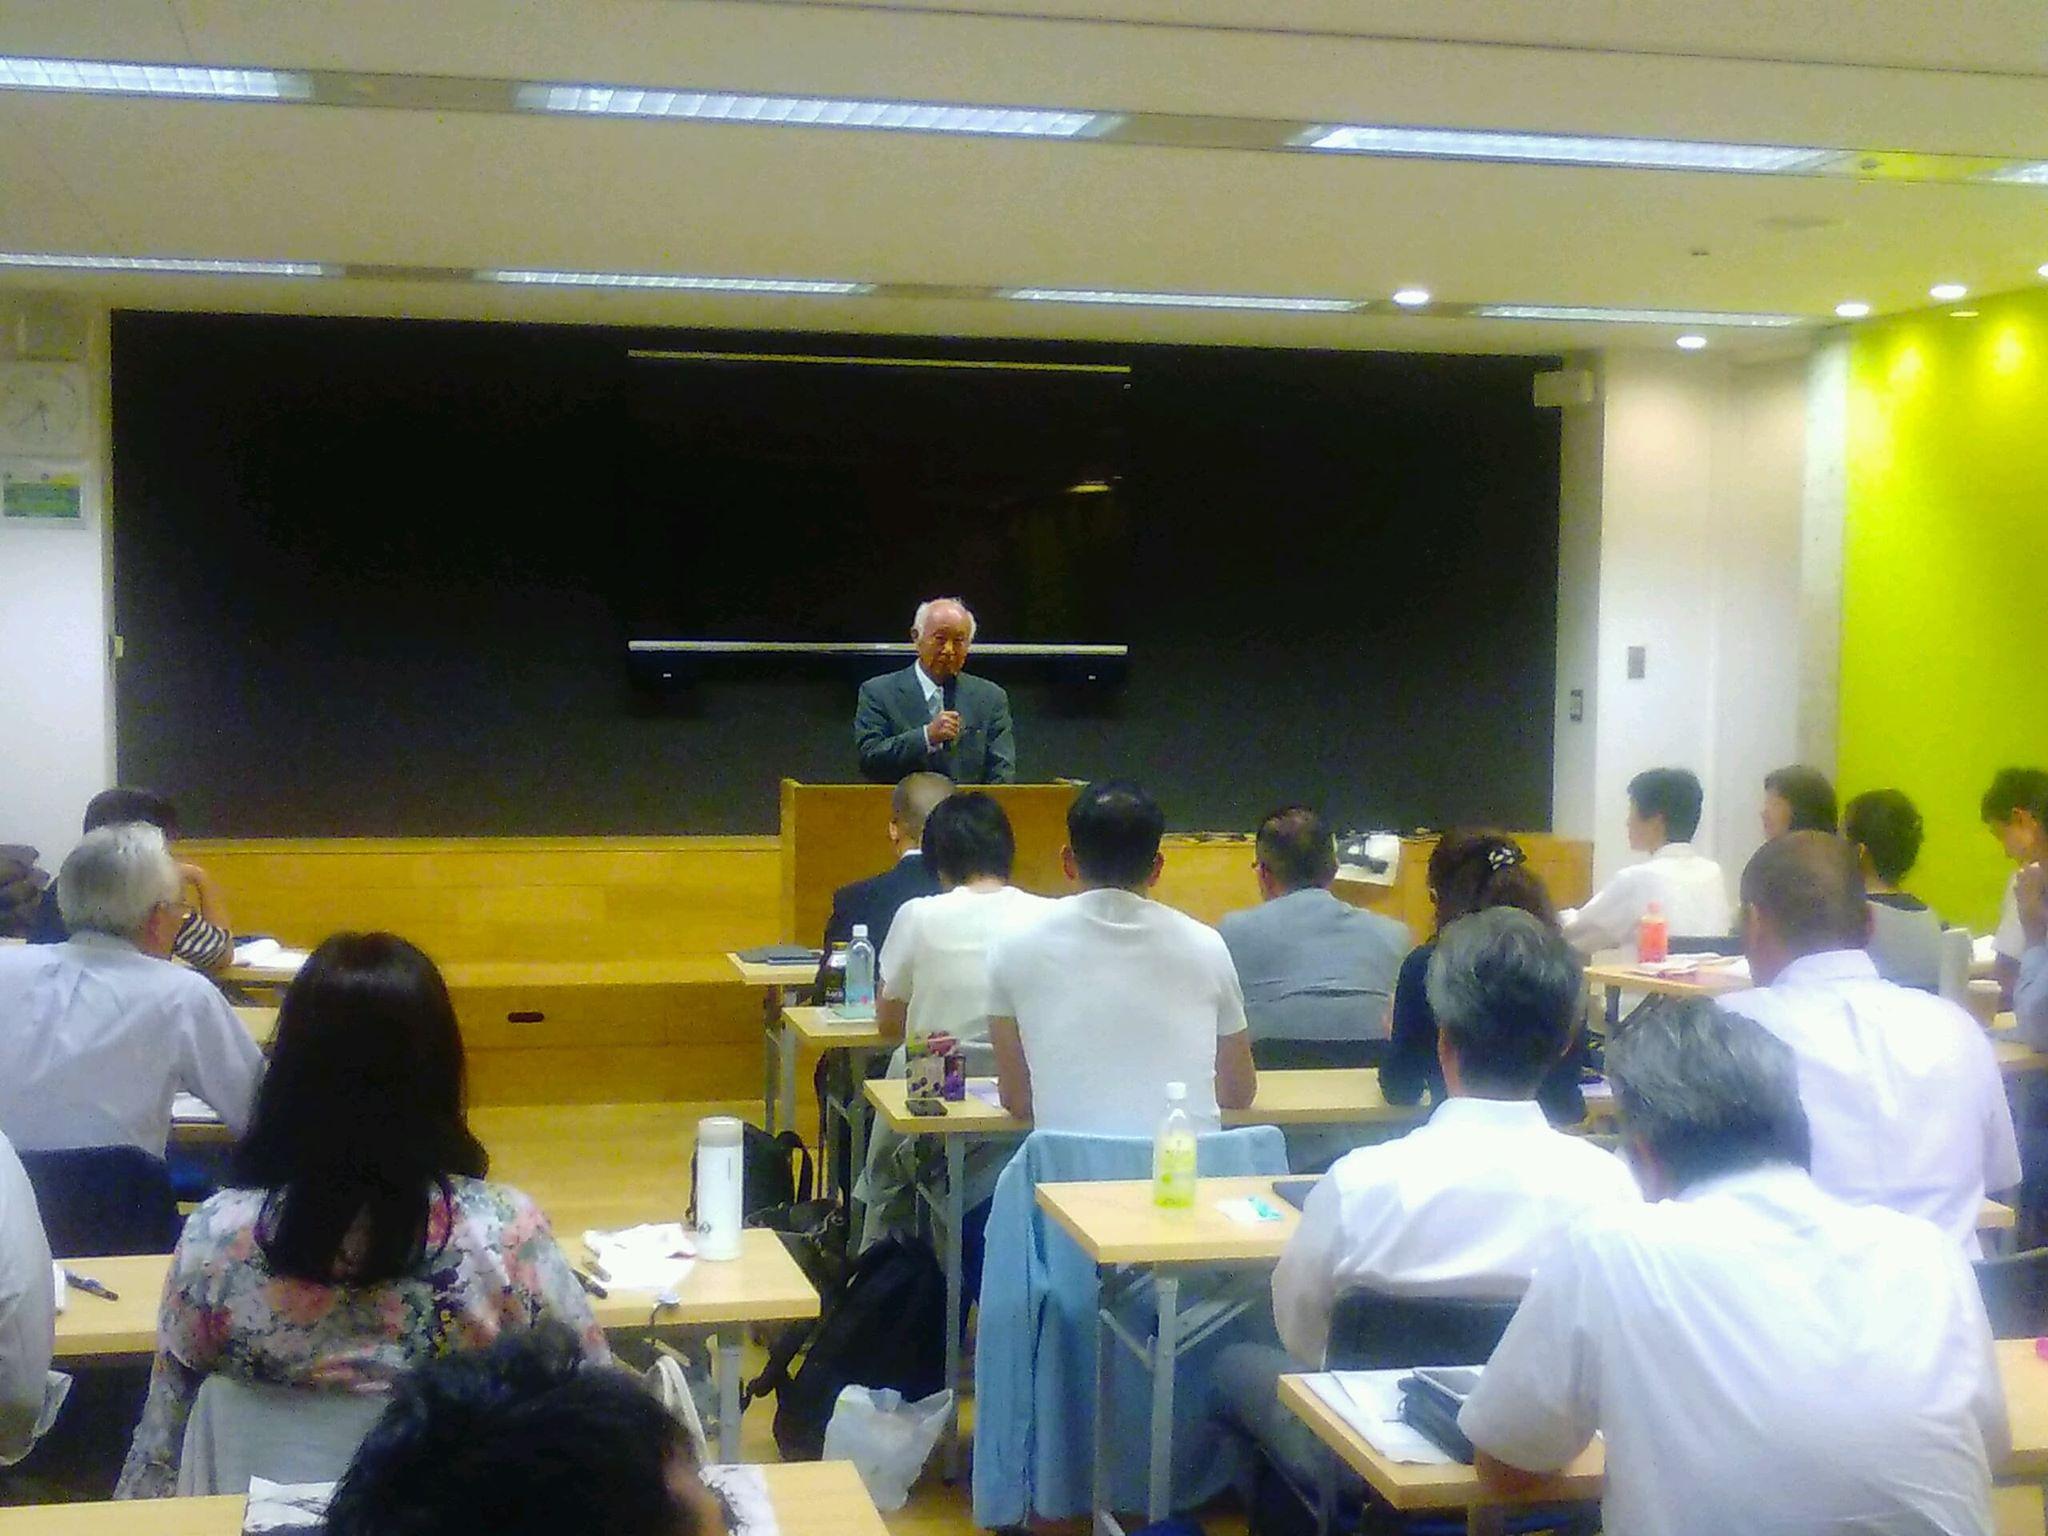 43162573 437343766794178 2534556189593698304 n - 2018年10月6日(土)第5回東京思風塾開催しました。